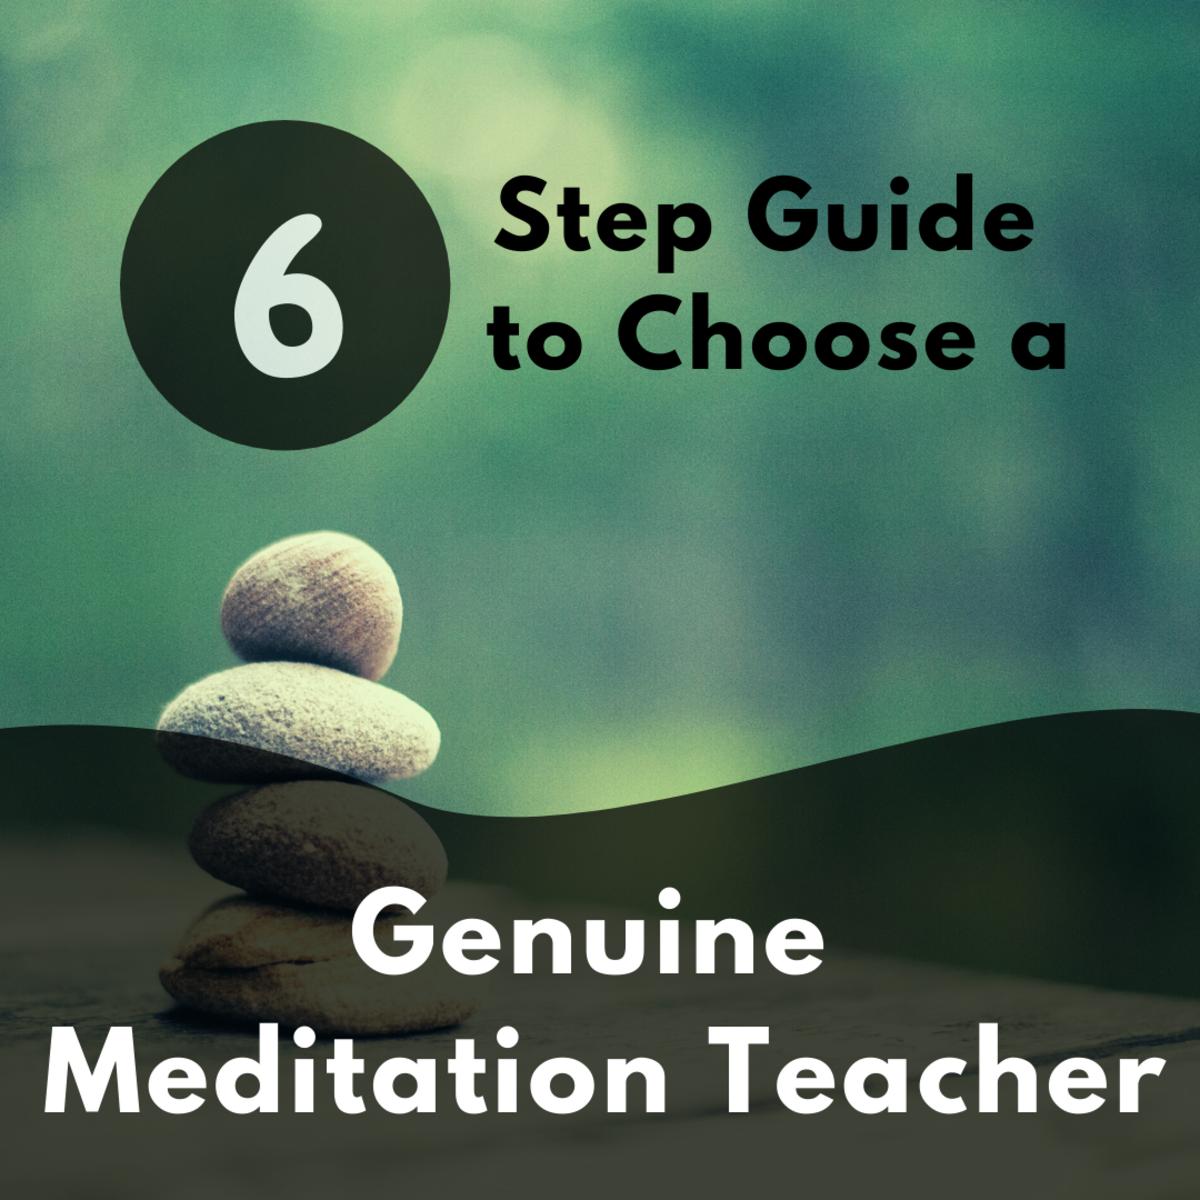 How to select a genuine meditation teacher?